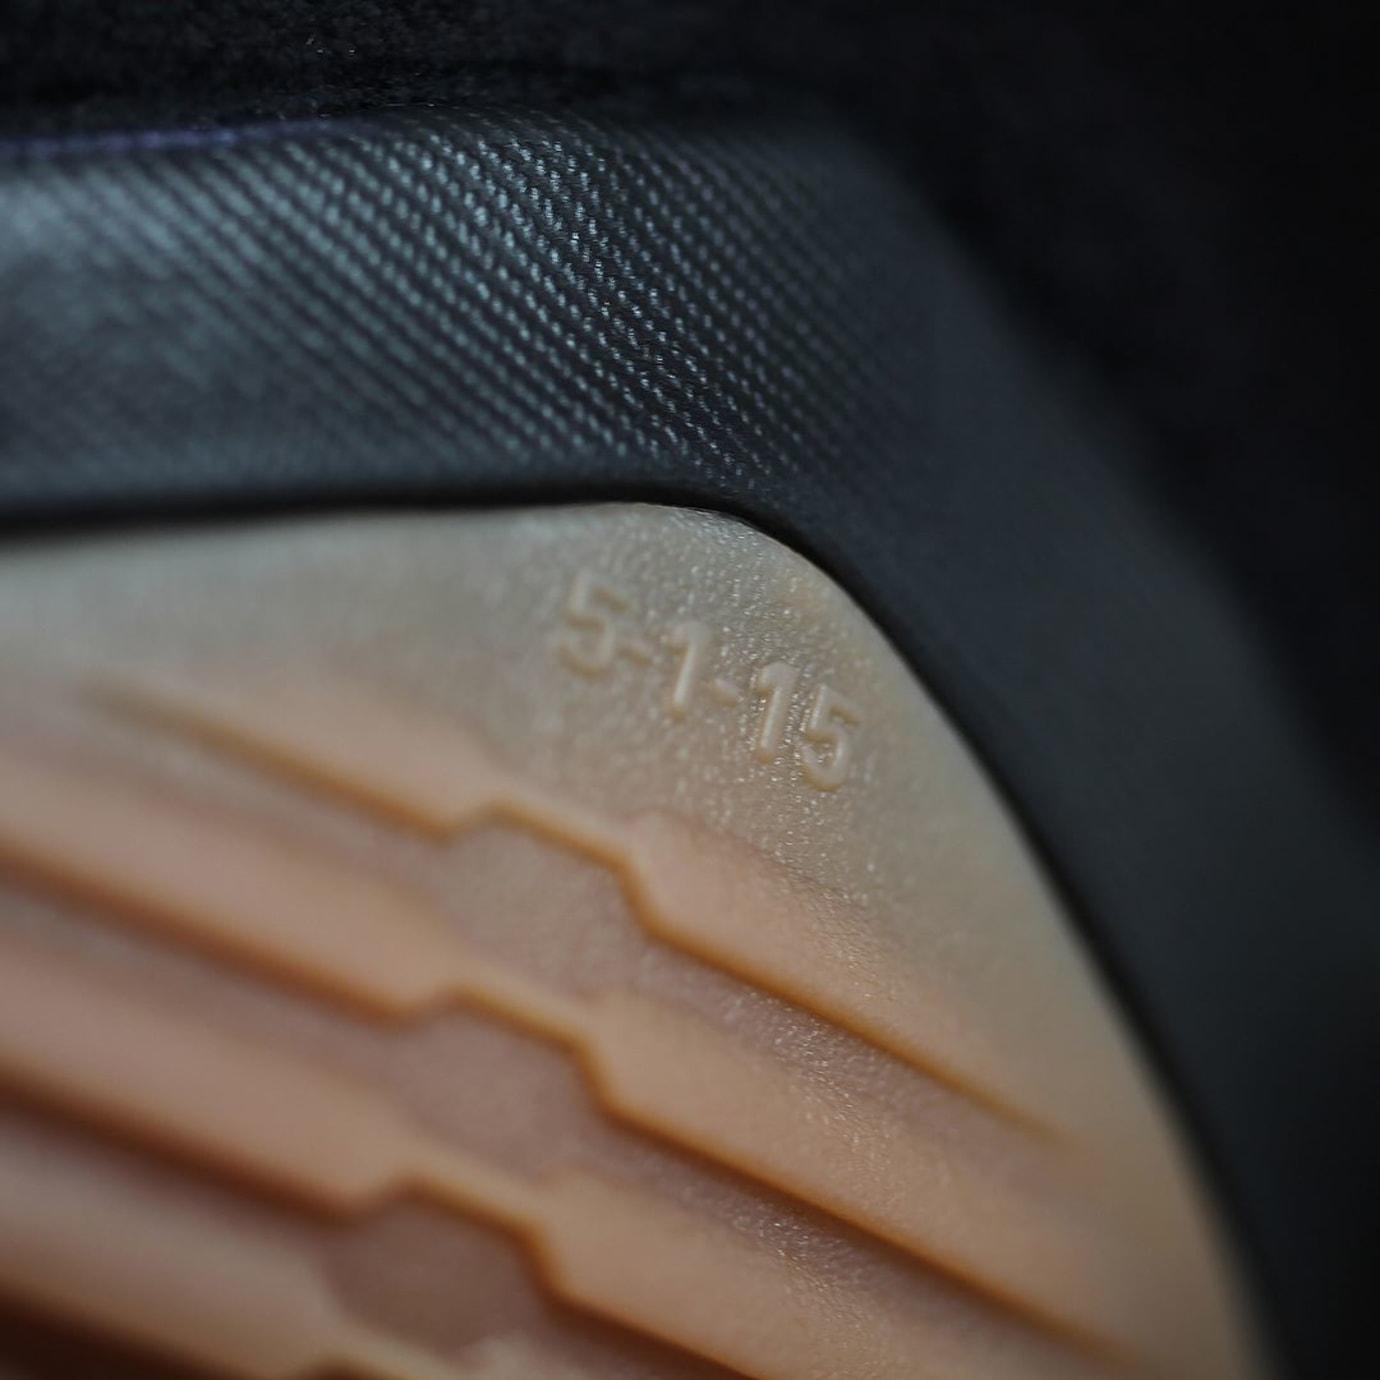 Nike PG1 Black Gum Release Date 878627-004 (11)